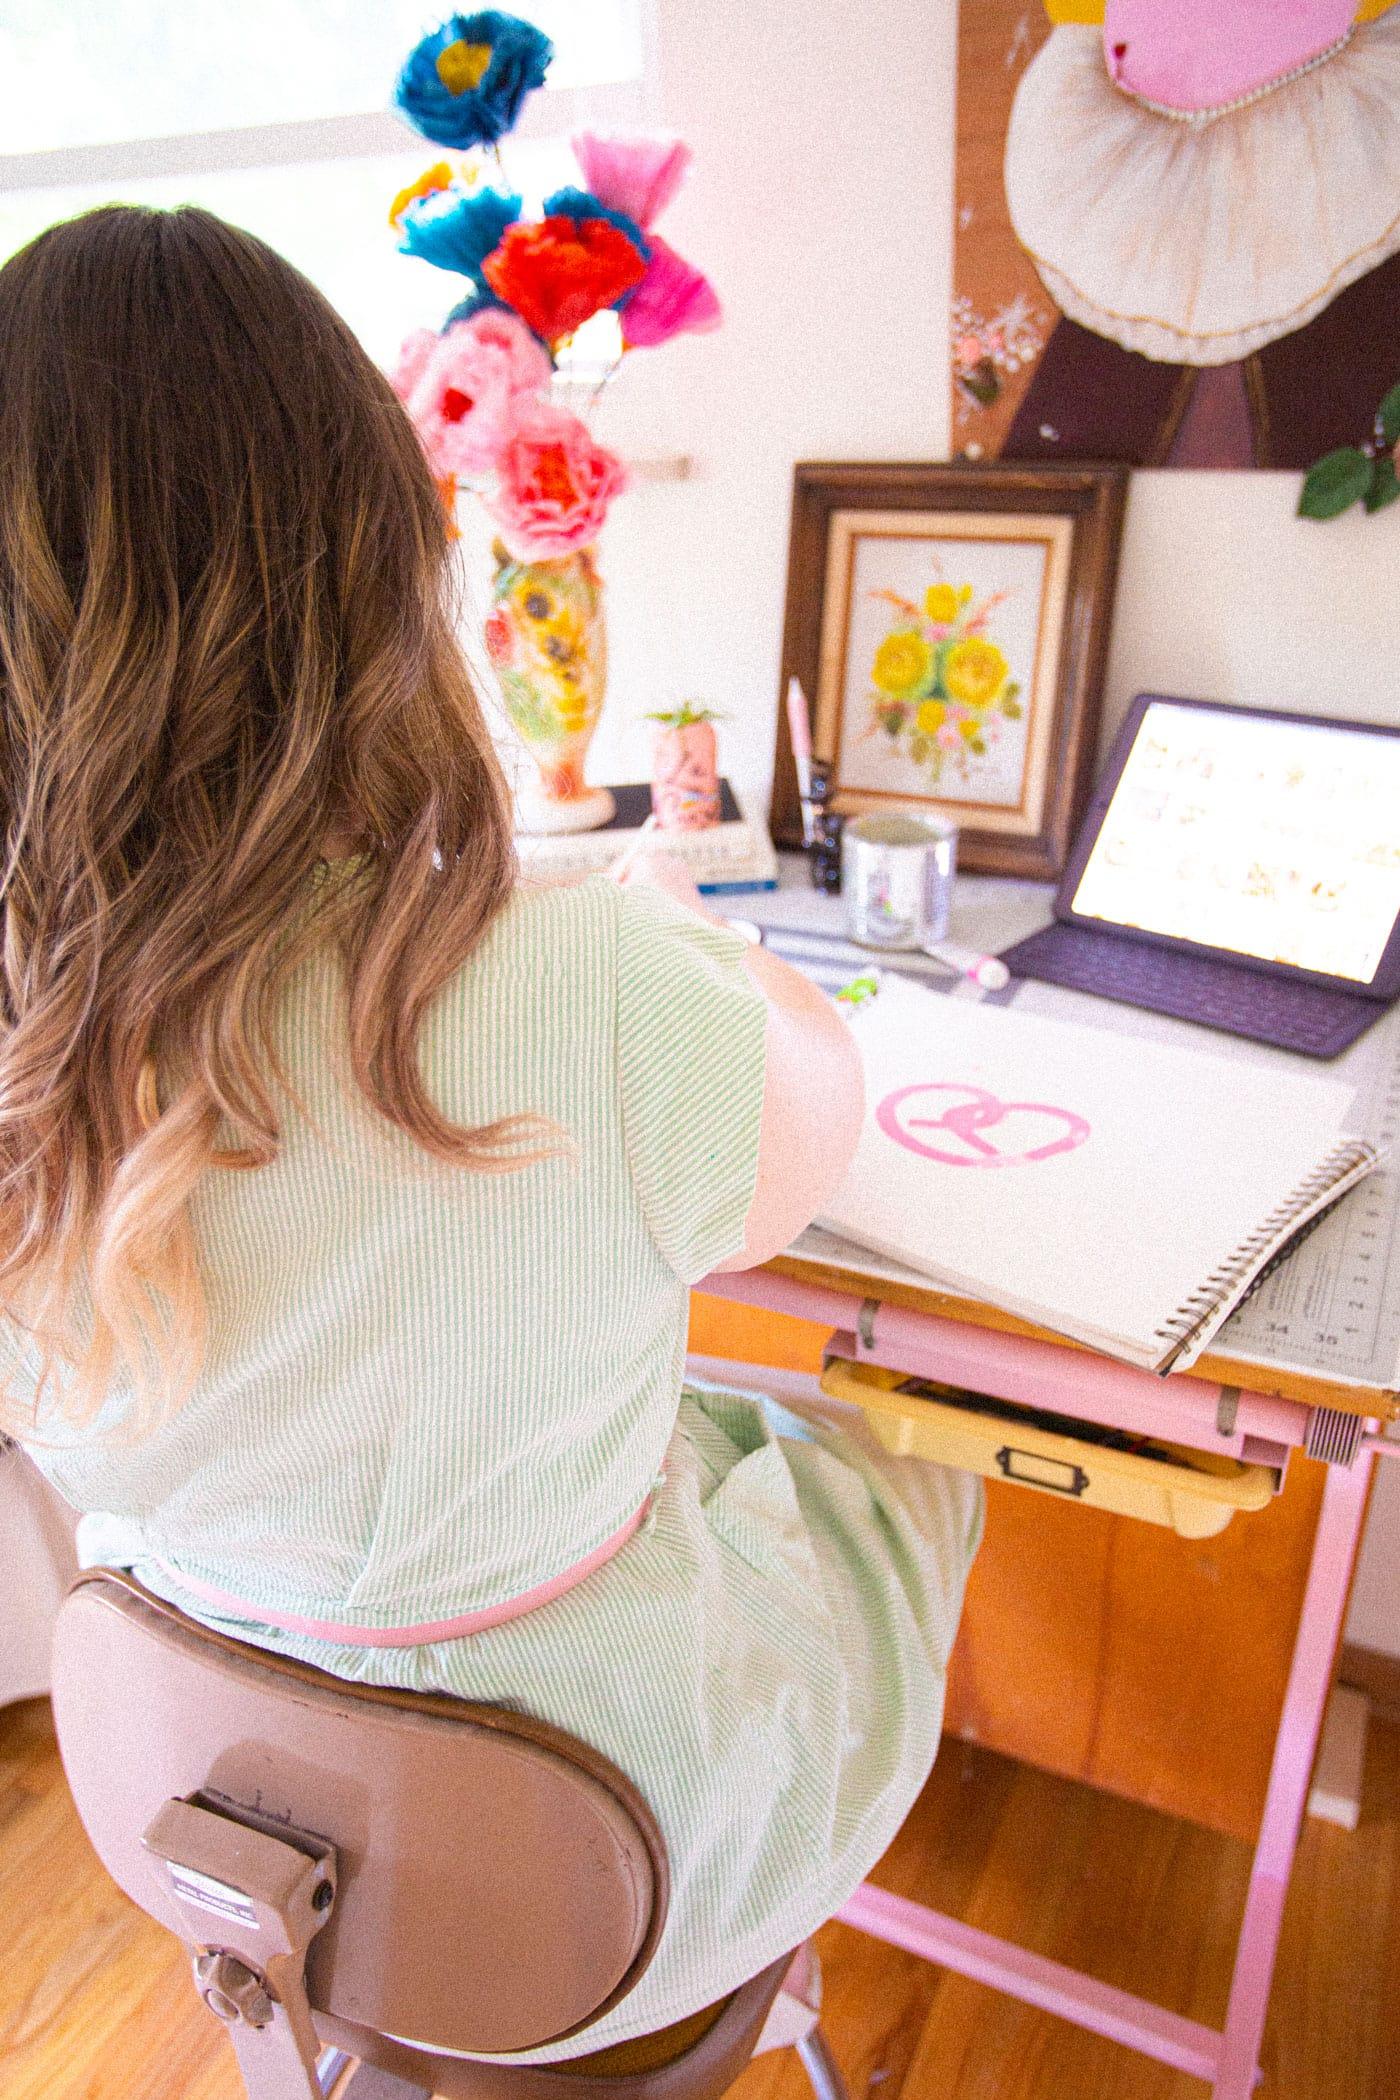 Louise sits at a desk painting a pink pretzel.